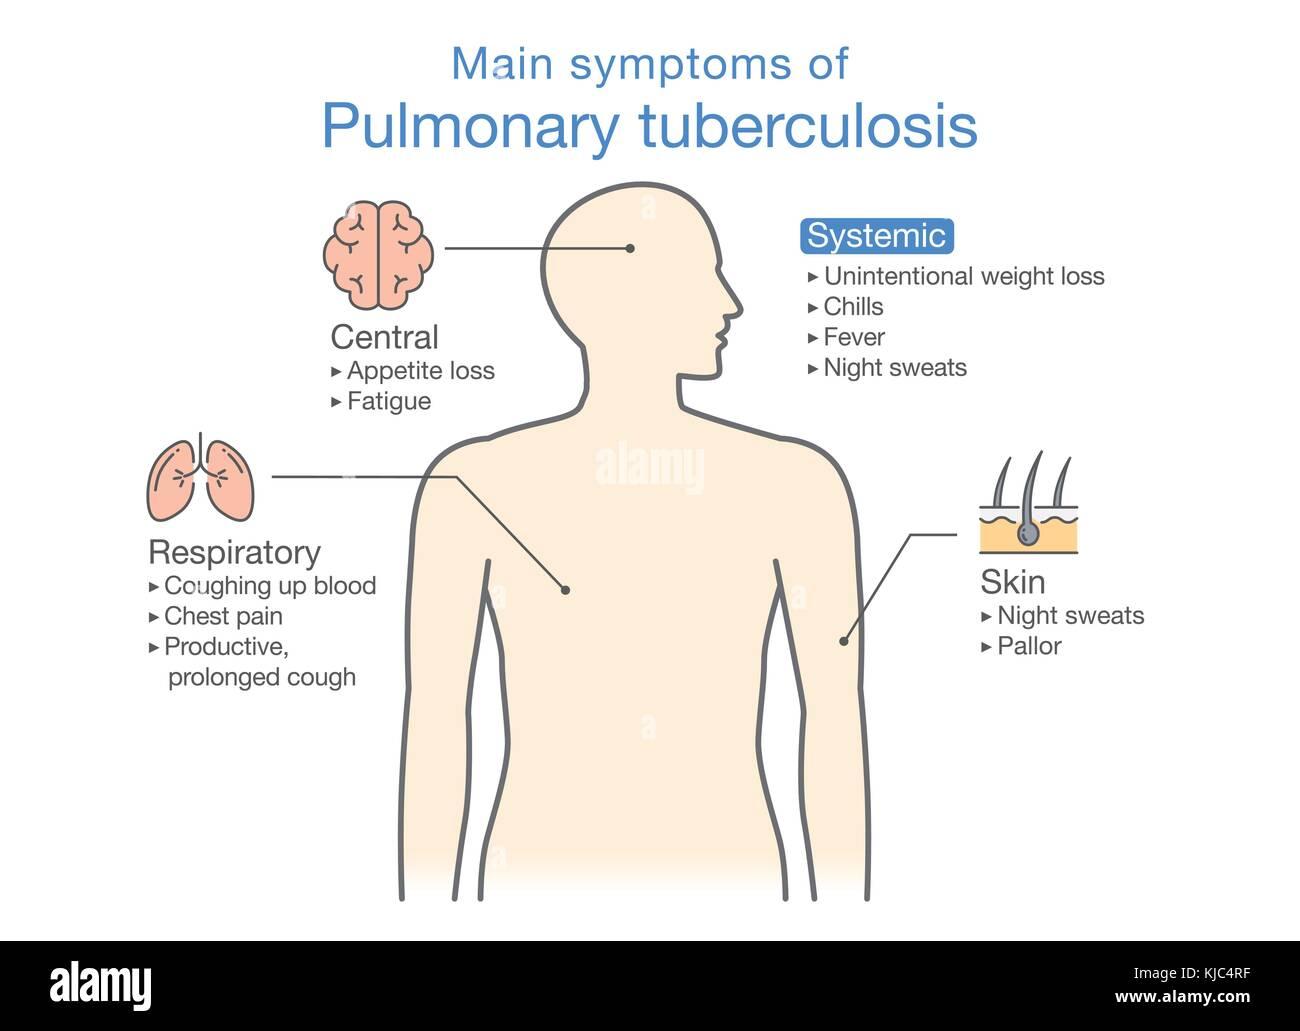 Main symptoms of Pulmonary Tuberculosis patient. - Stock Image